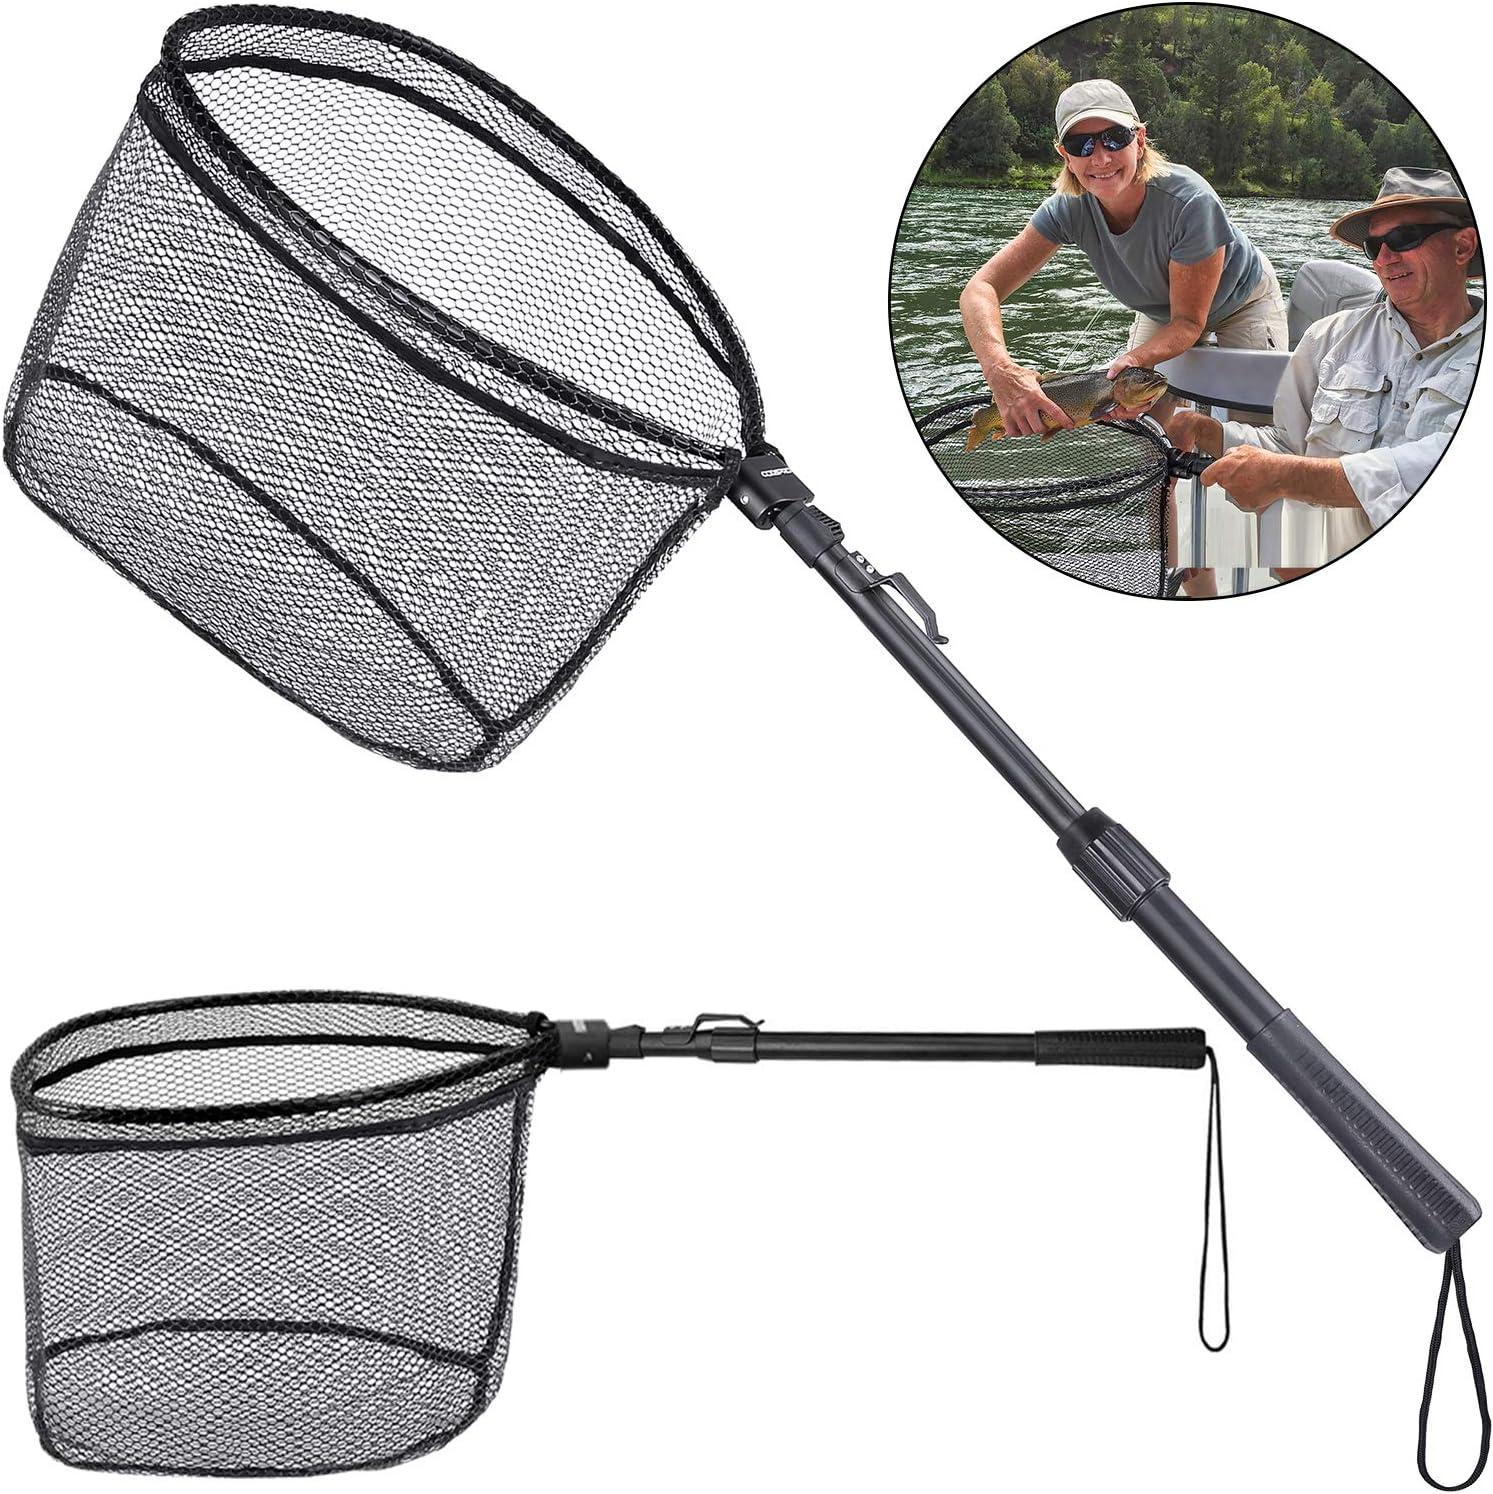 Mrocioa Fishing Net Angling Landing Nets Fishing Folding Landing Net